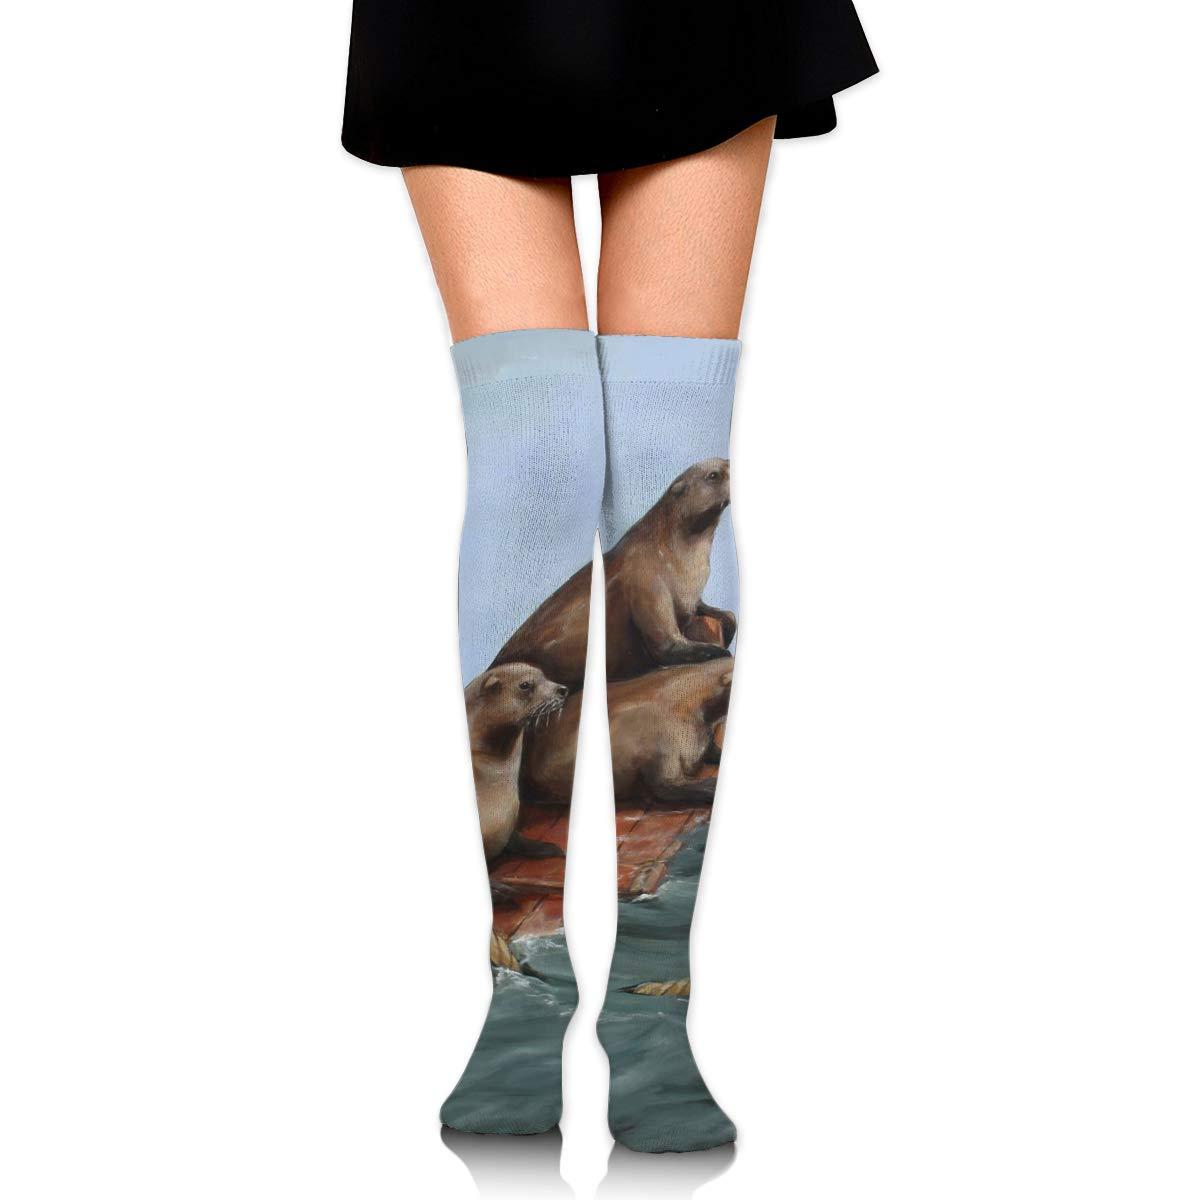 High Elasticity Girl Cotton Knee High Socks Uniform Sea Wood Sea Lions Women Tube Socks